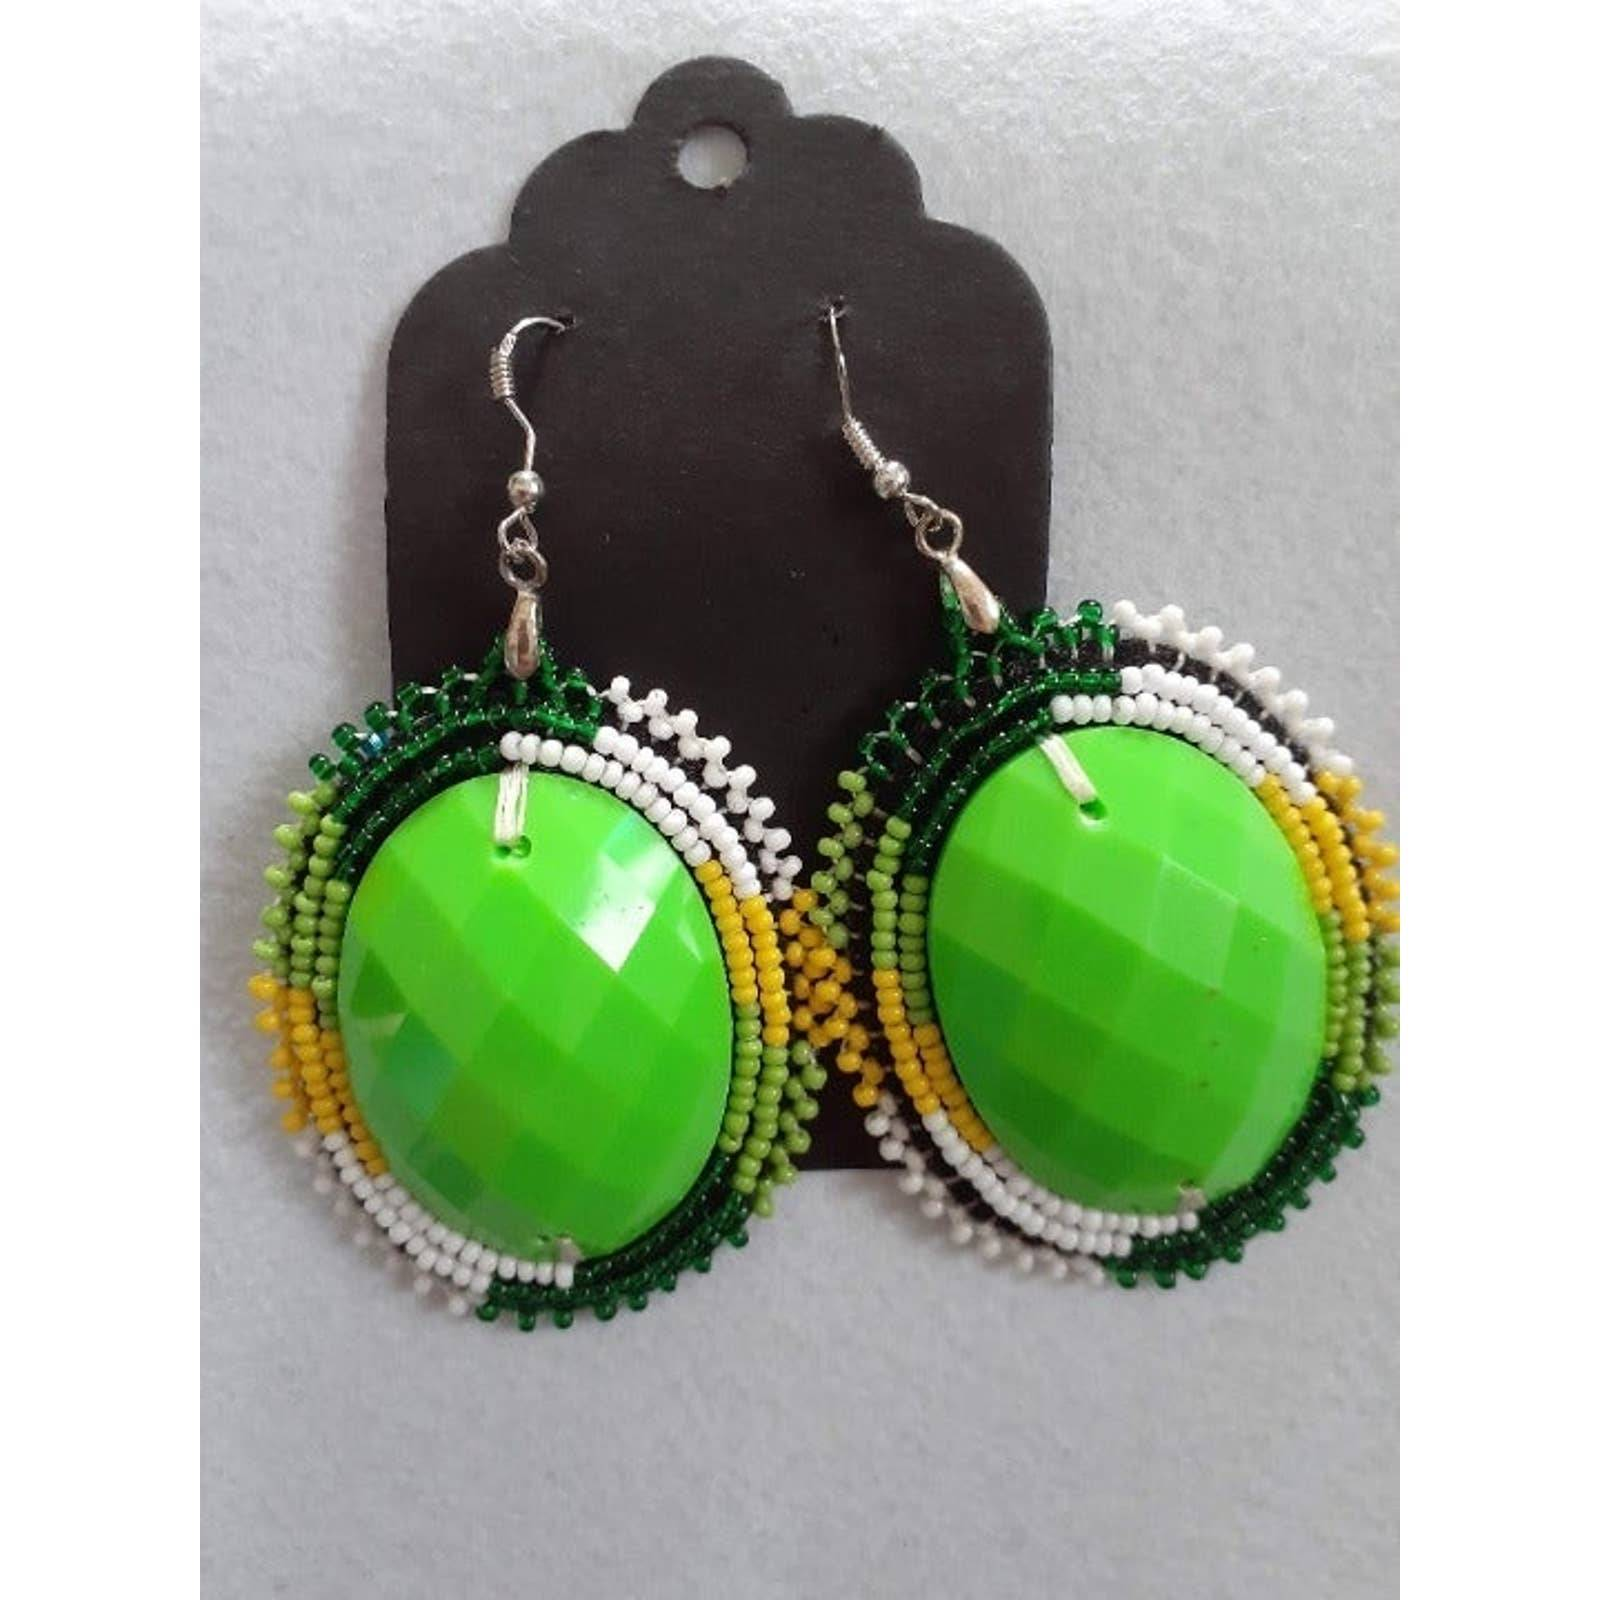 Handmade Green Bead Applique Earrings